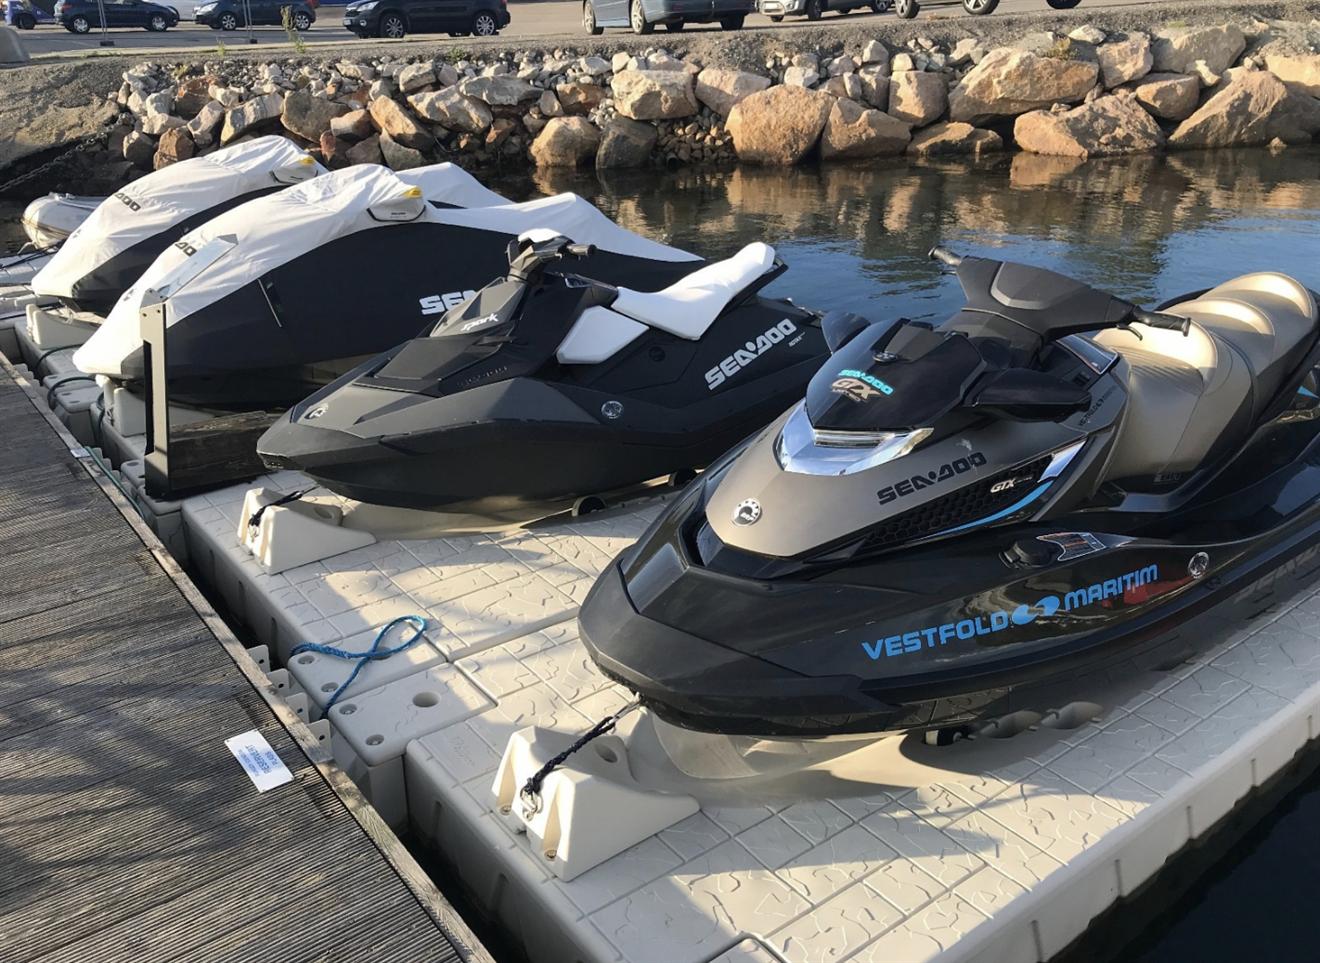 2022: Vannscooter sommerplass med scooter rampe